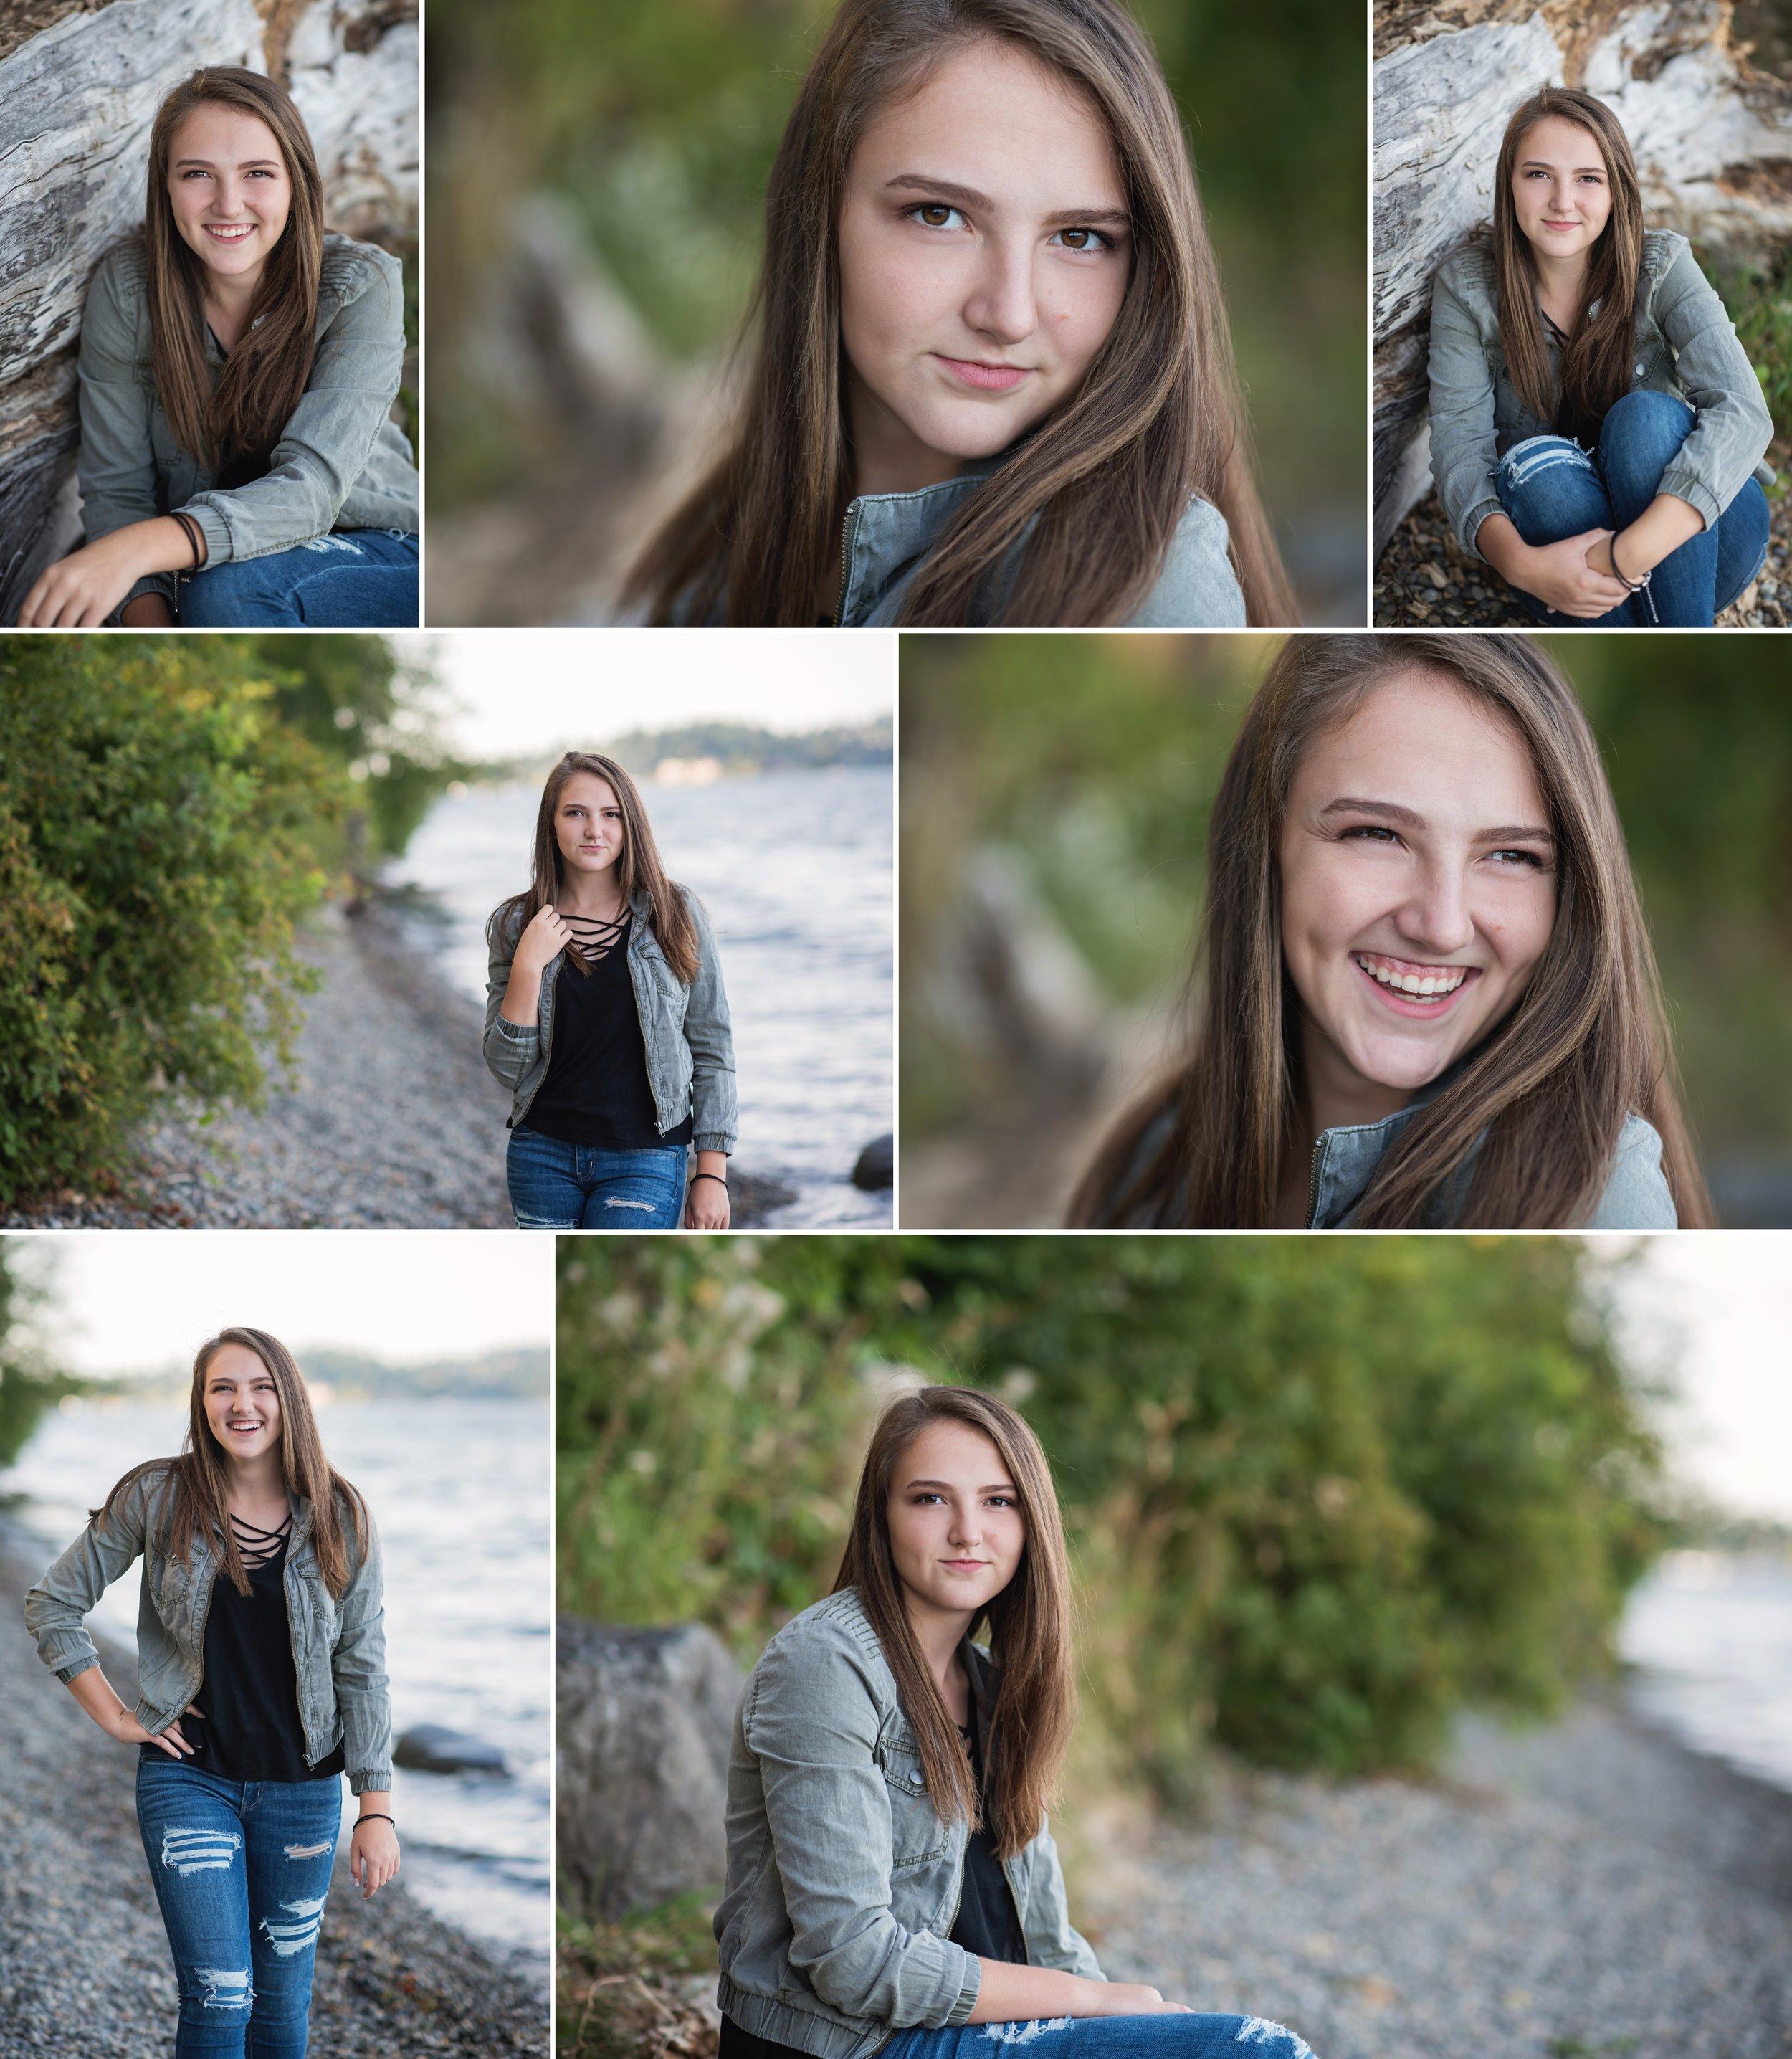 Mary Vance Photography Senior Girl Sammamish Washington, Luther Burbank Park Mercer Island